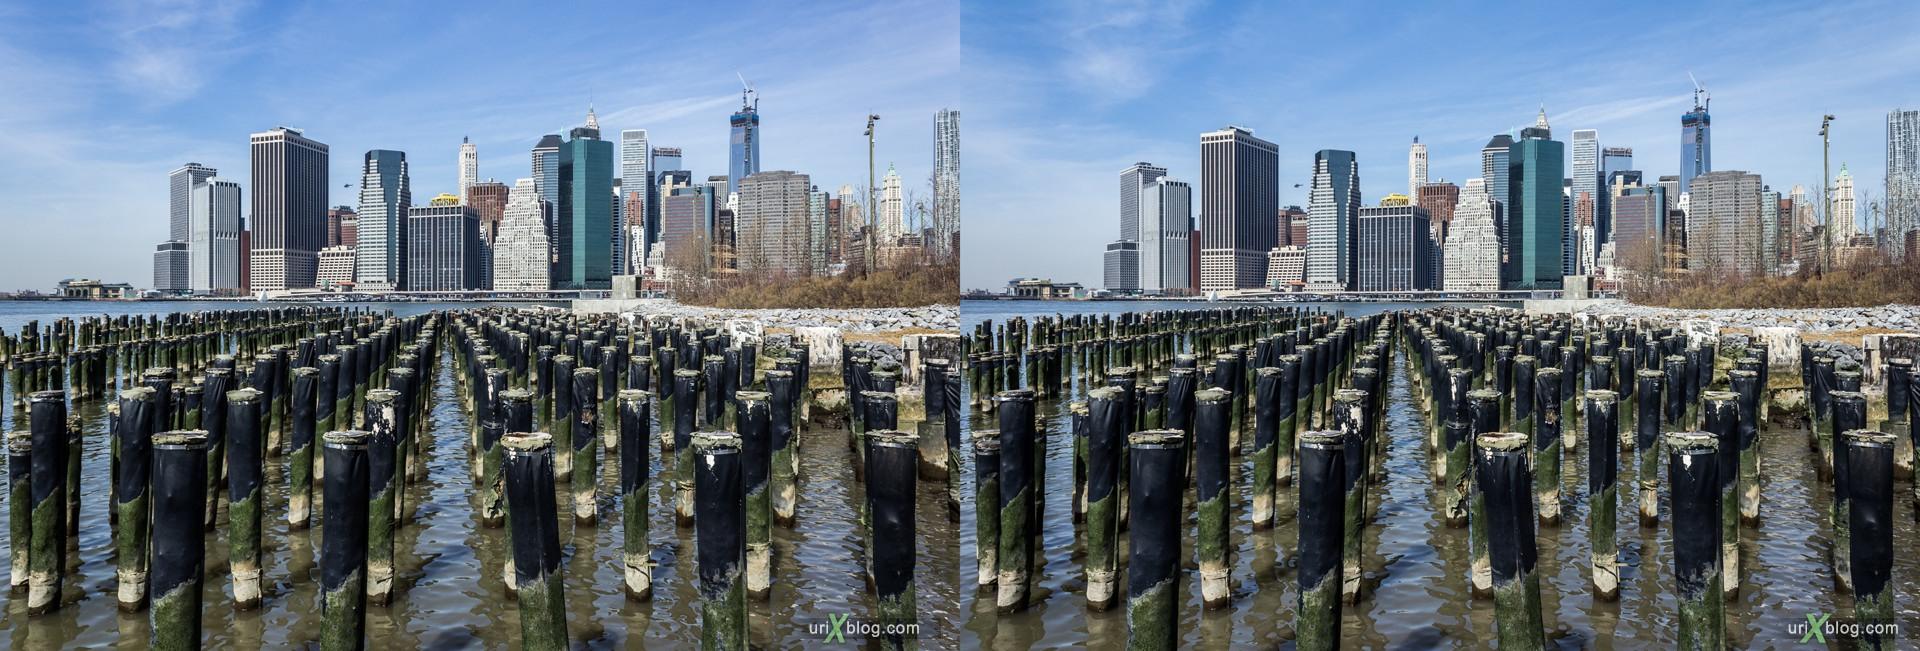 2013, Манхеттен, Бруклин, Нью-Йорк, США, 3D, перекрёстные стереопары, стерео, стереопара, стереопары